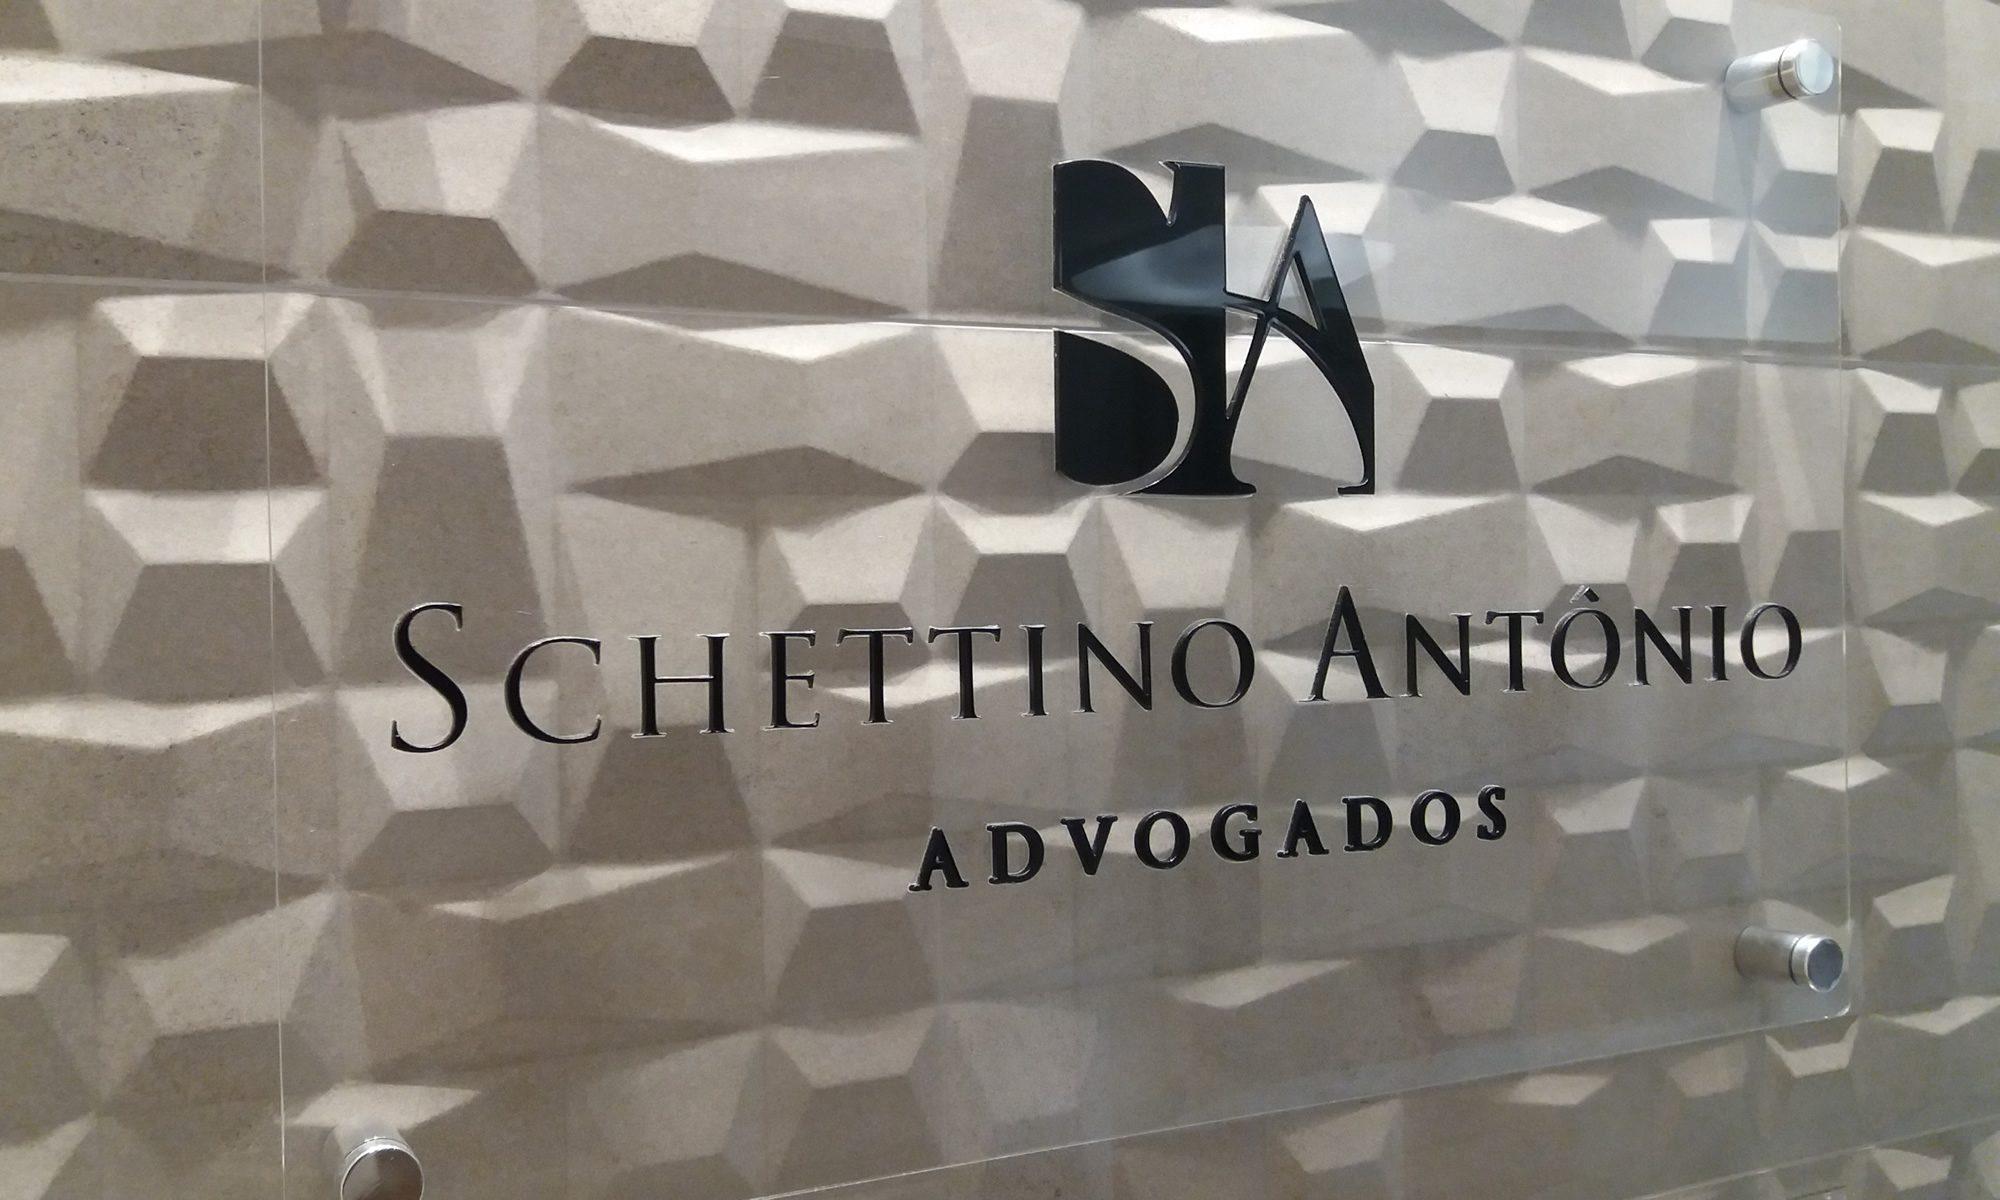 Schettino Antônio Advogados